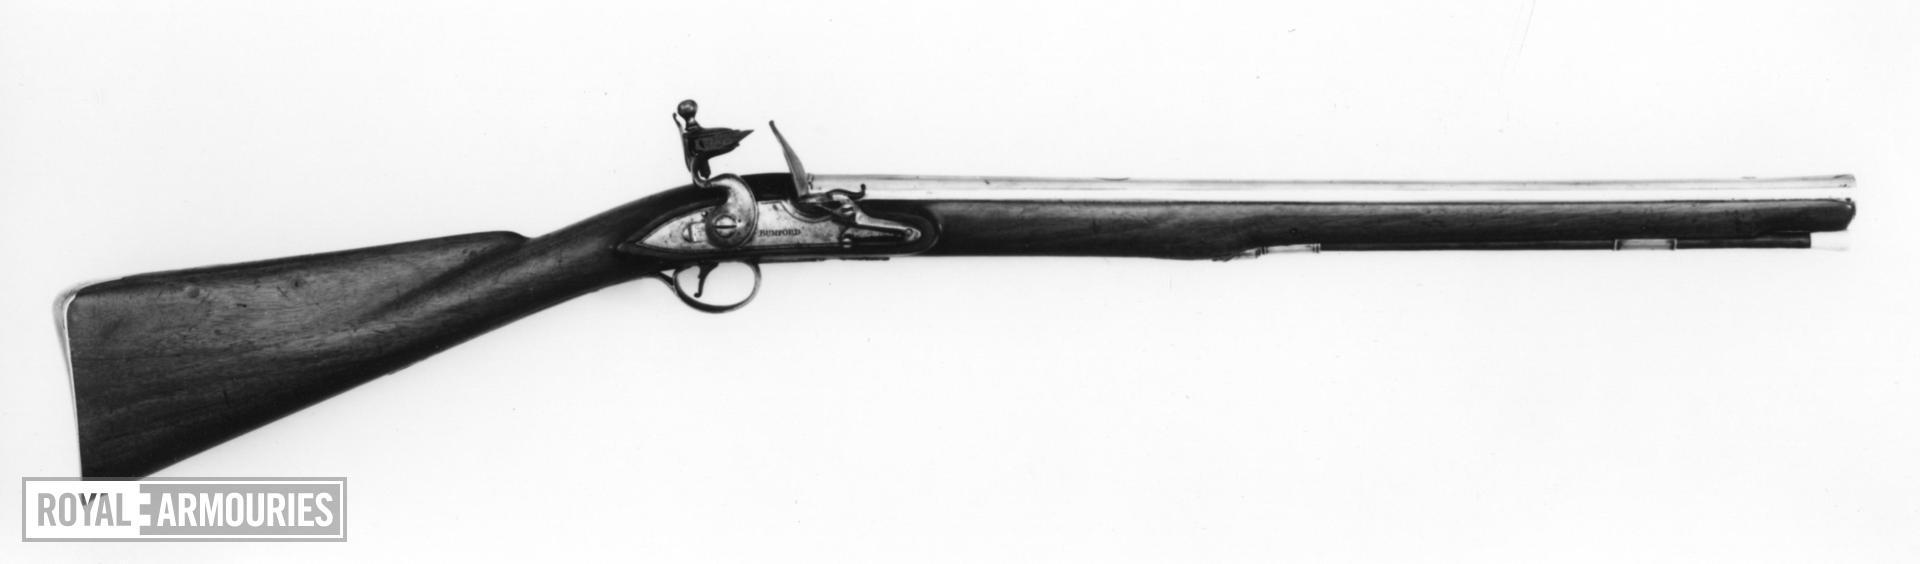 Flintlock muzzle-loading carbine - By Bumford